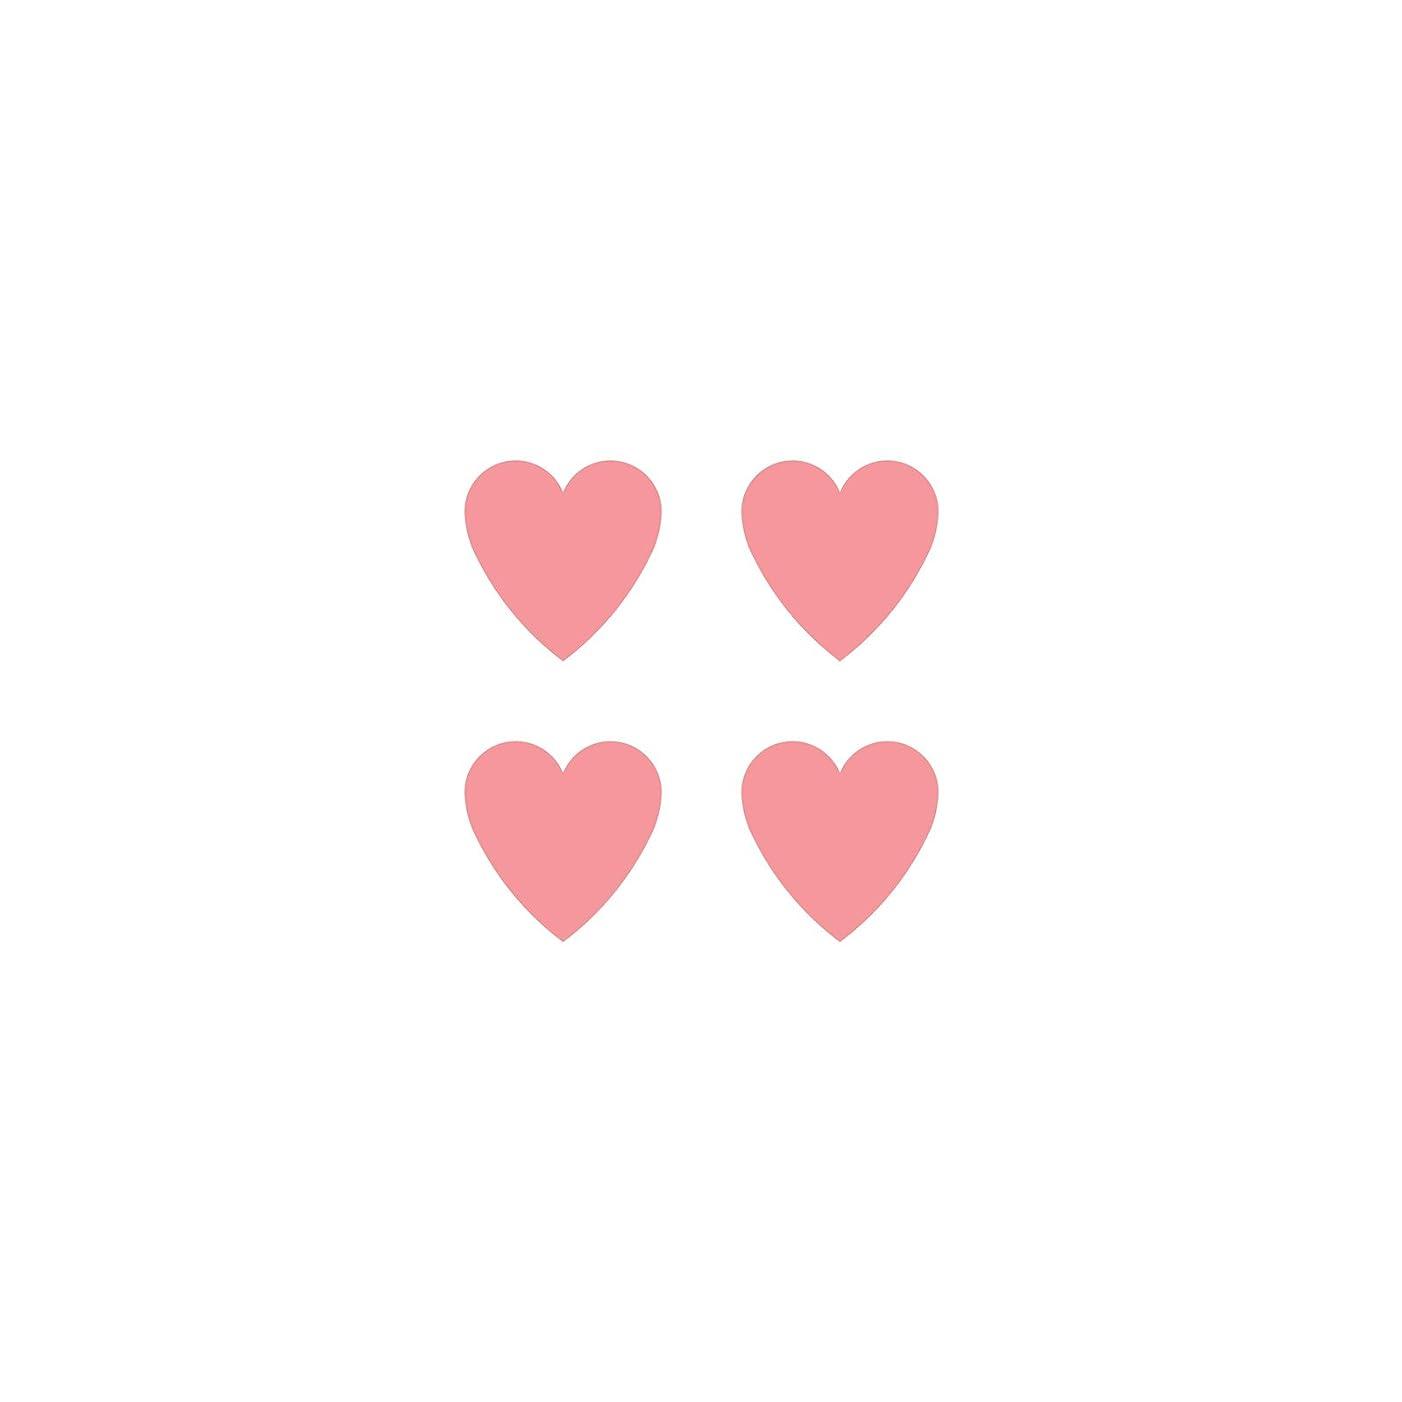 Ellison SureCut Die - Hearts, Tiny